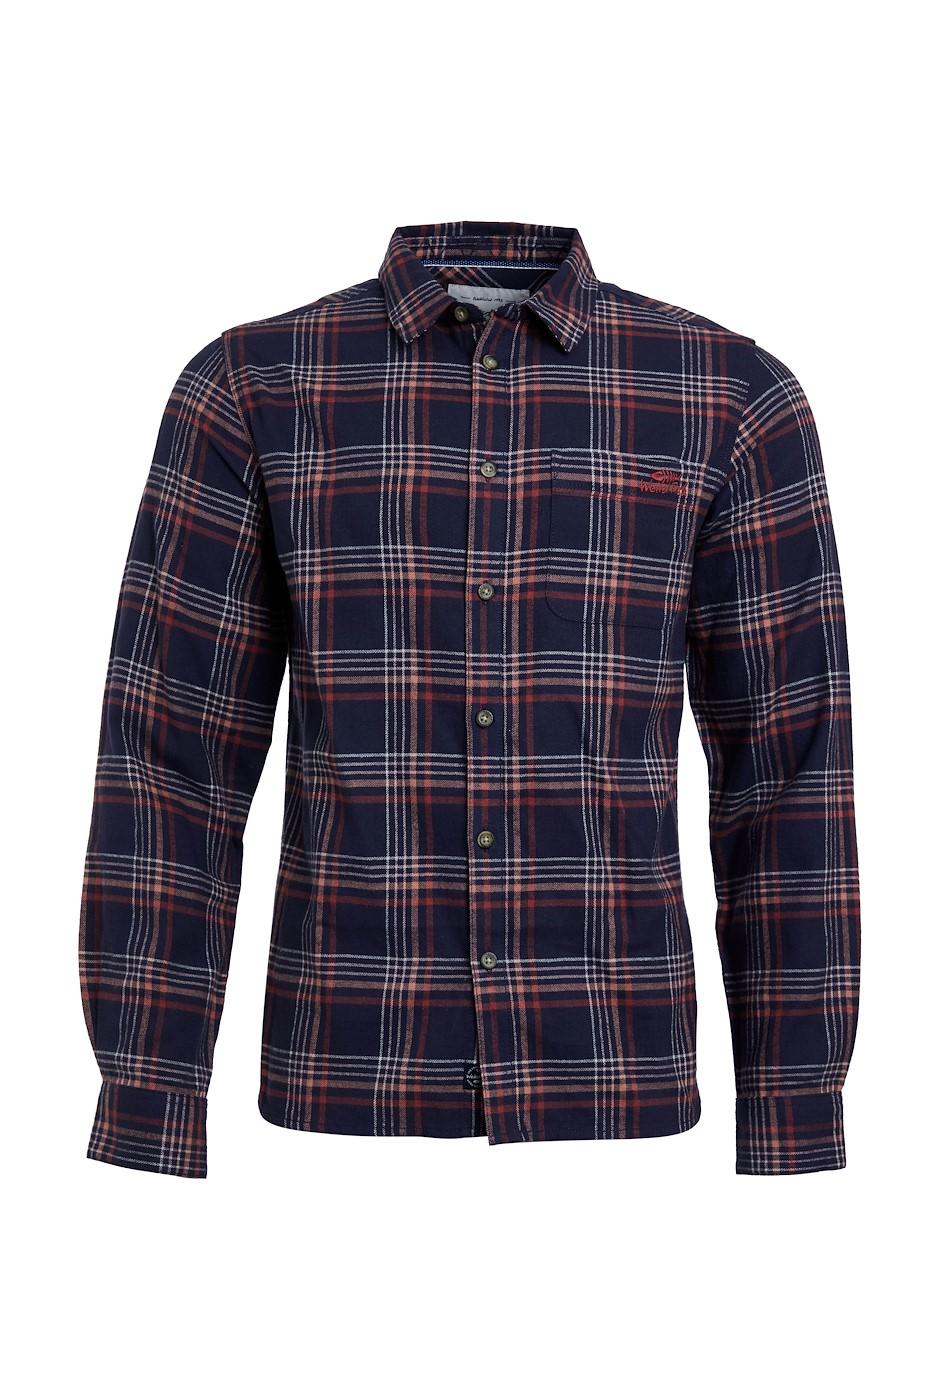 Beasley Organic Long Sleeve Herringbone Check Shirt  Navy